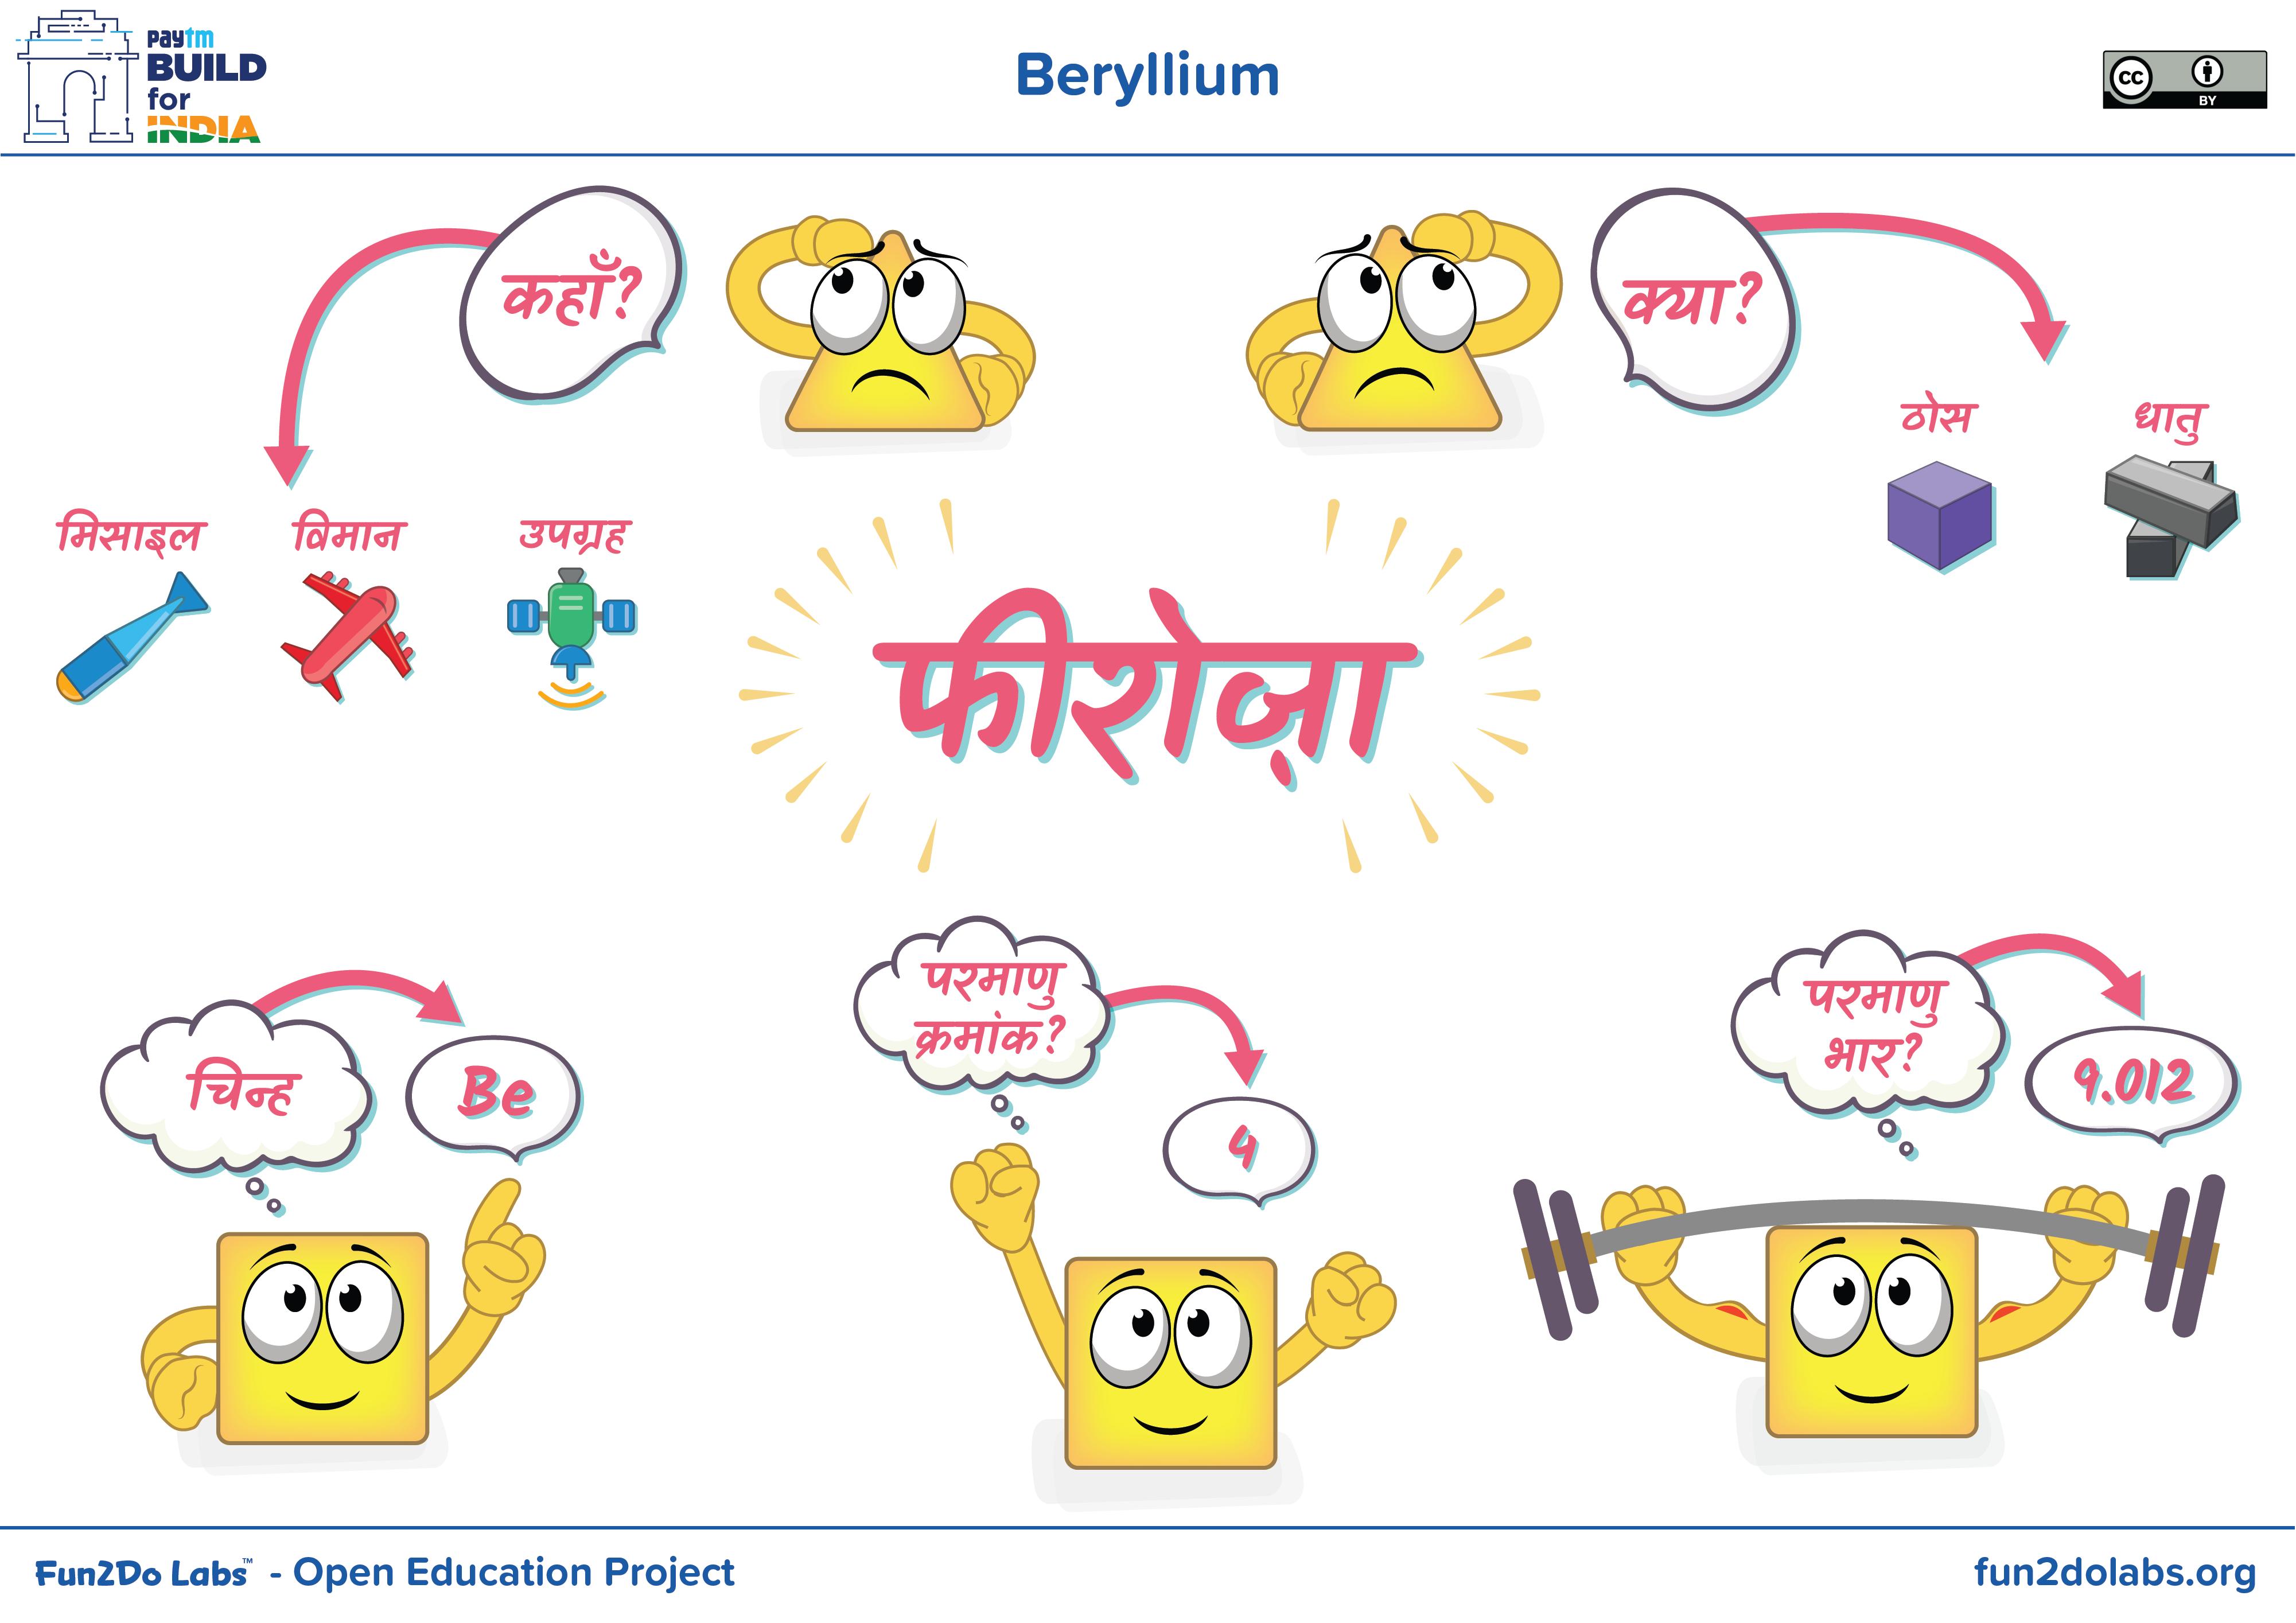 Poster In Hindi For Teaching Beryllium To Kids Beryllium Element Beryllium Atom Model Fun Education Educational Projects Element Chemistry